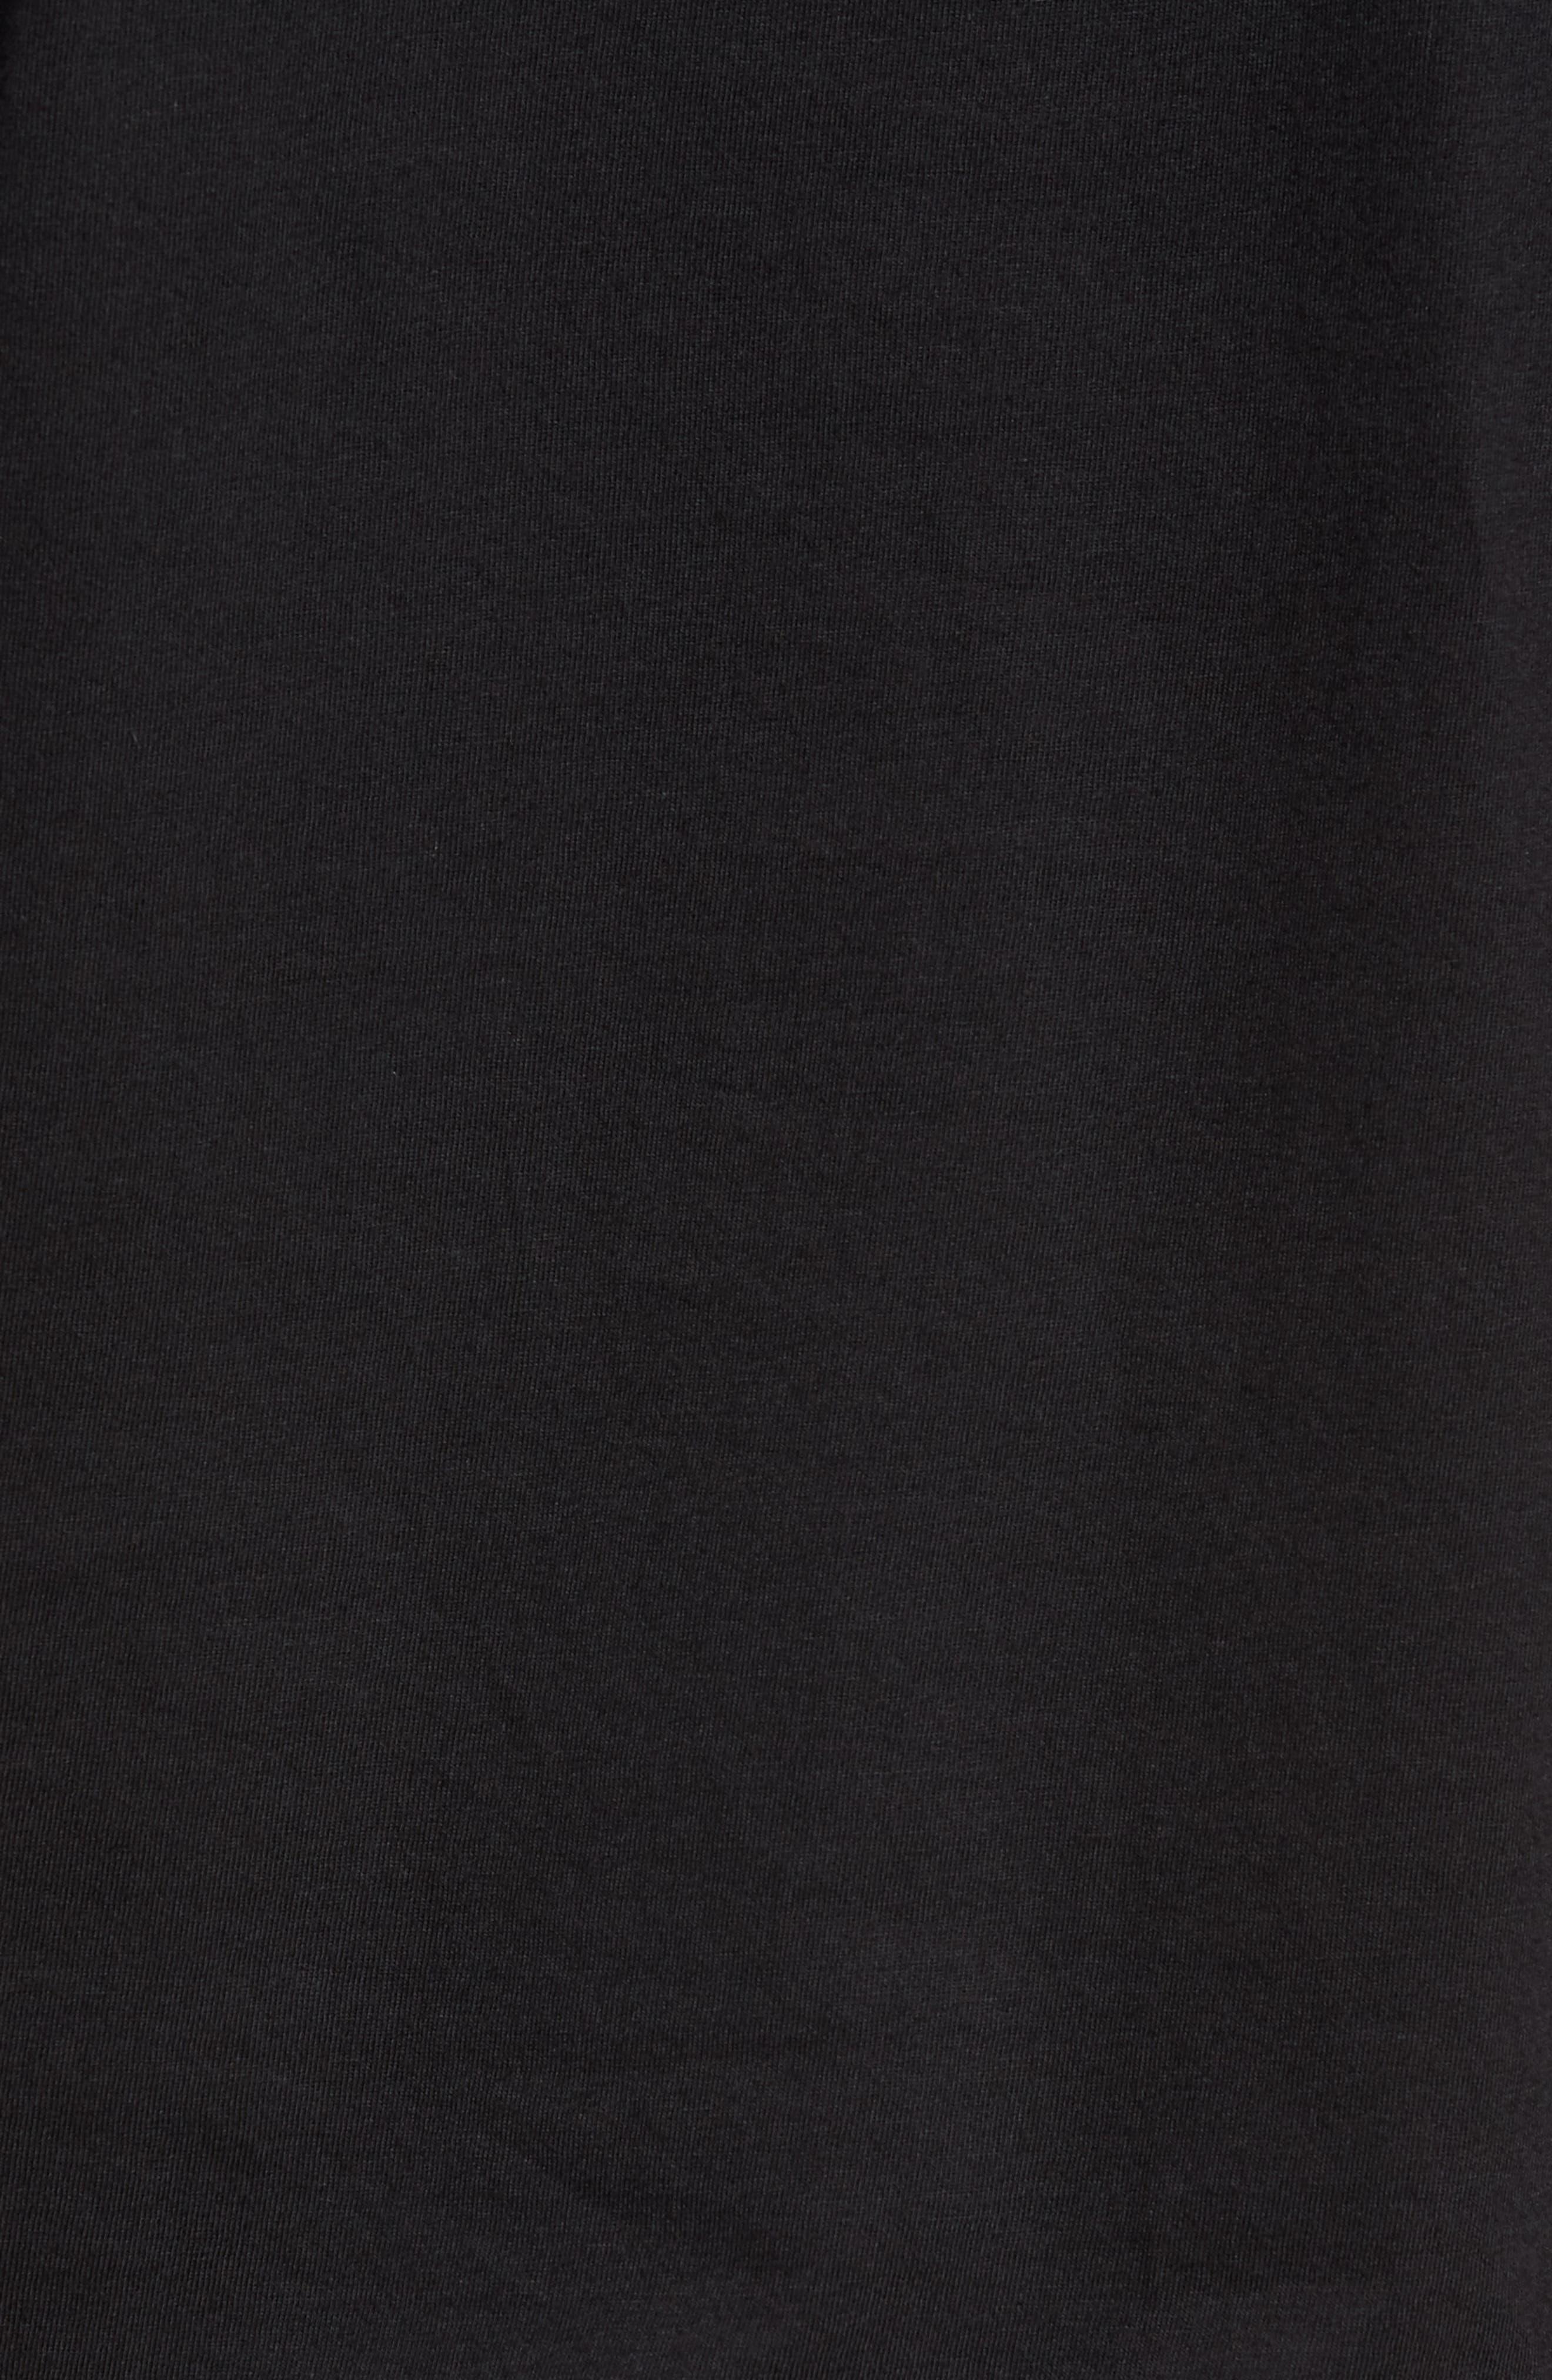 Polo Ralph Lauren 3-Pack V-Neck T-Shirts,                             Alternate thumbnail 6, color,                             POLO BLACK